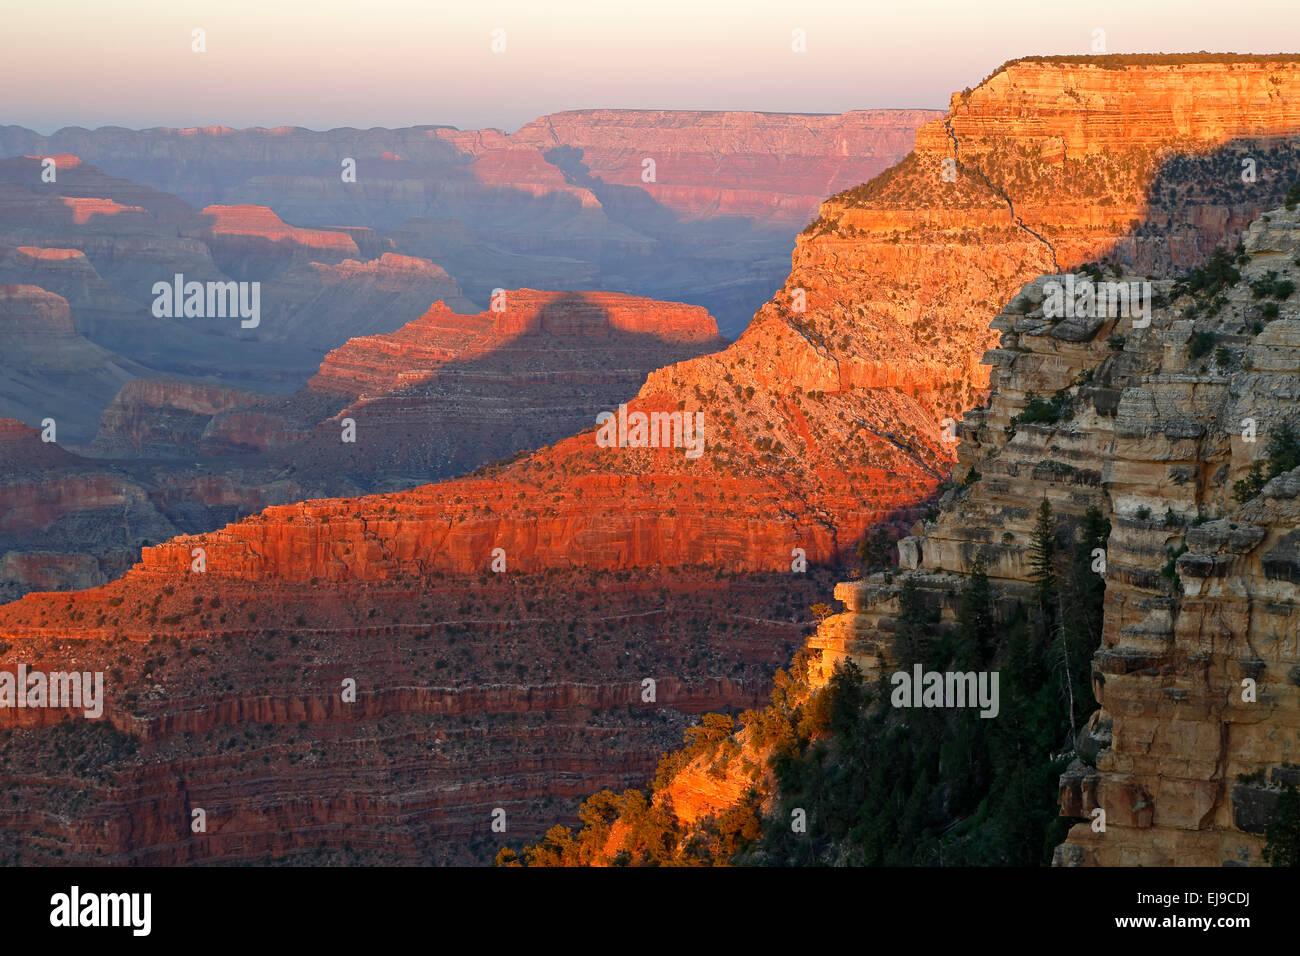 Canyon rock formations from near Yavapai Point, Grand Canyon National Park, Arizona USA - Stock Image